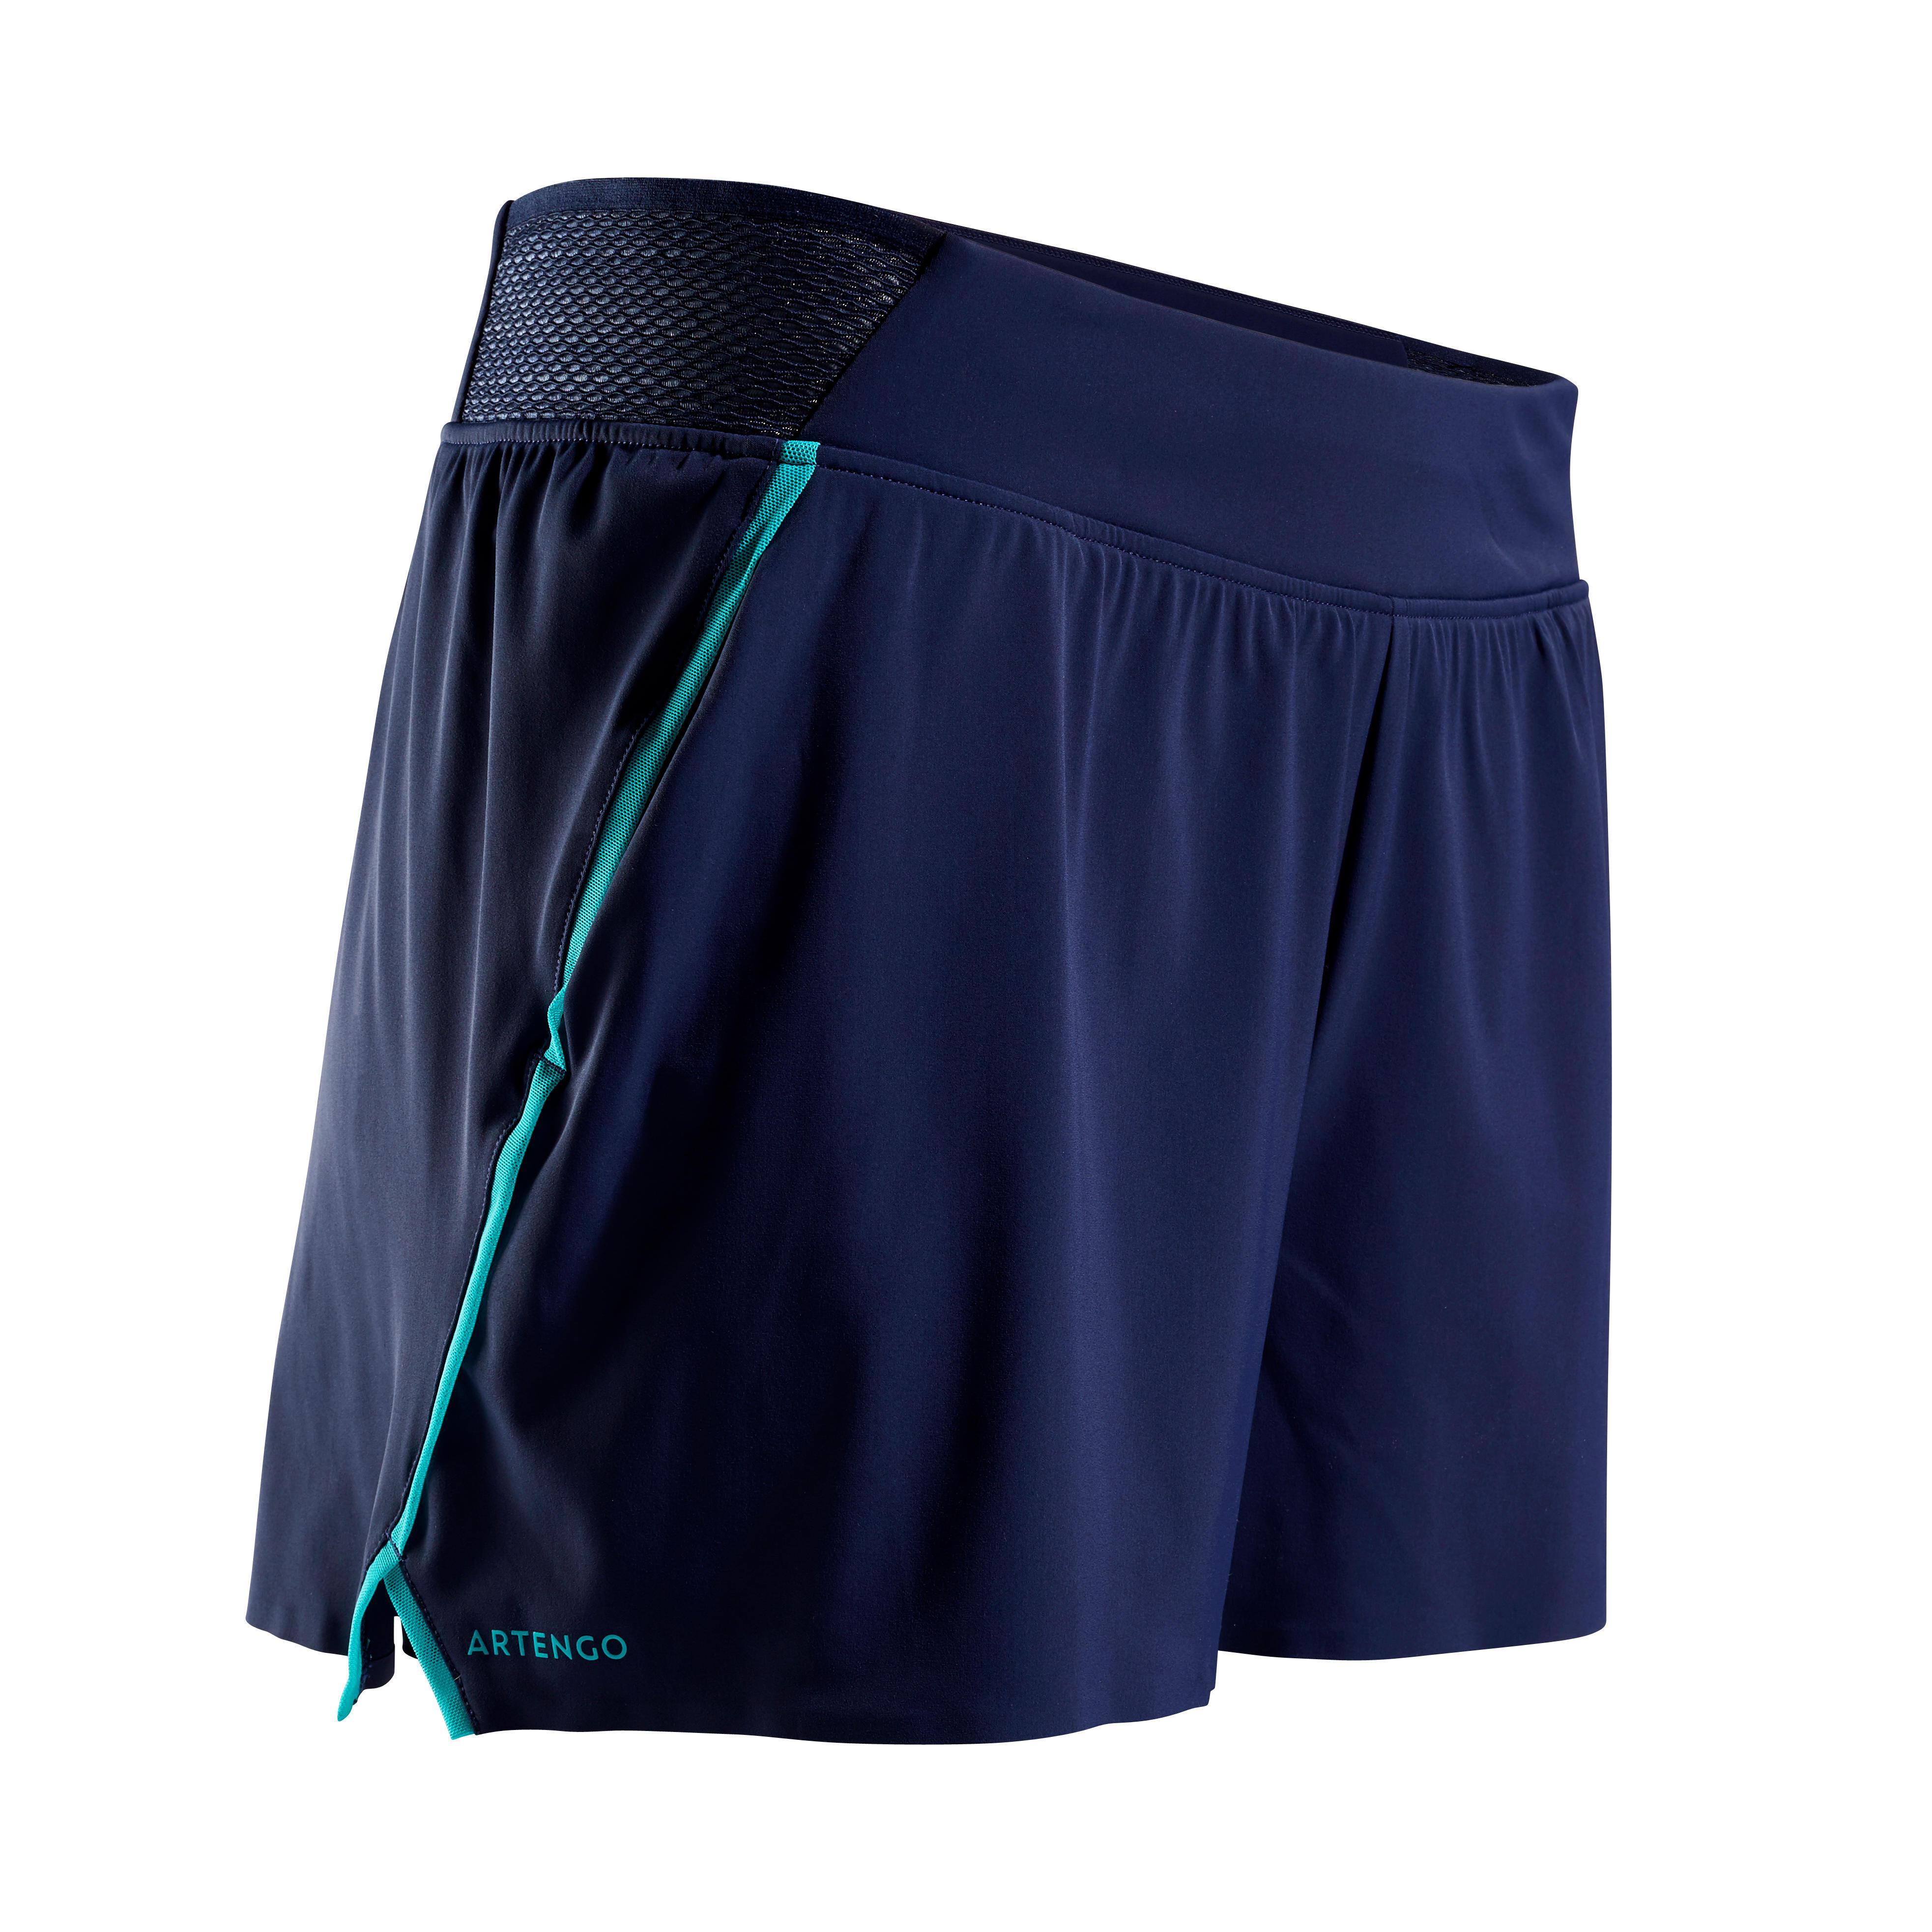 Tennis-Shorts SH light 900 Tennis Damen | Sportbekleidung > Sporthosen > Tennisshorts | Artengo